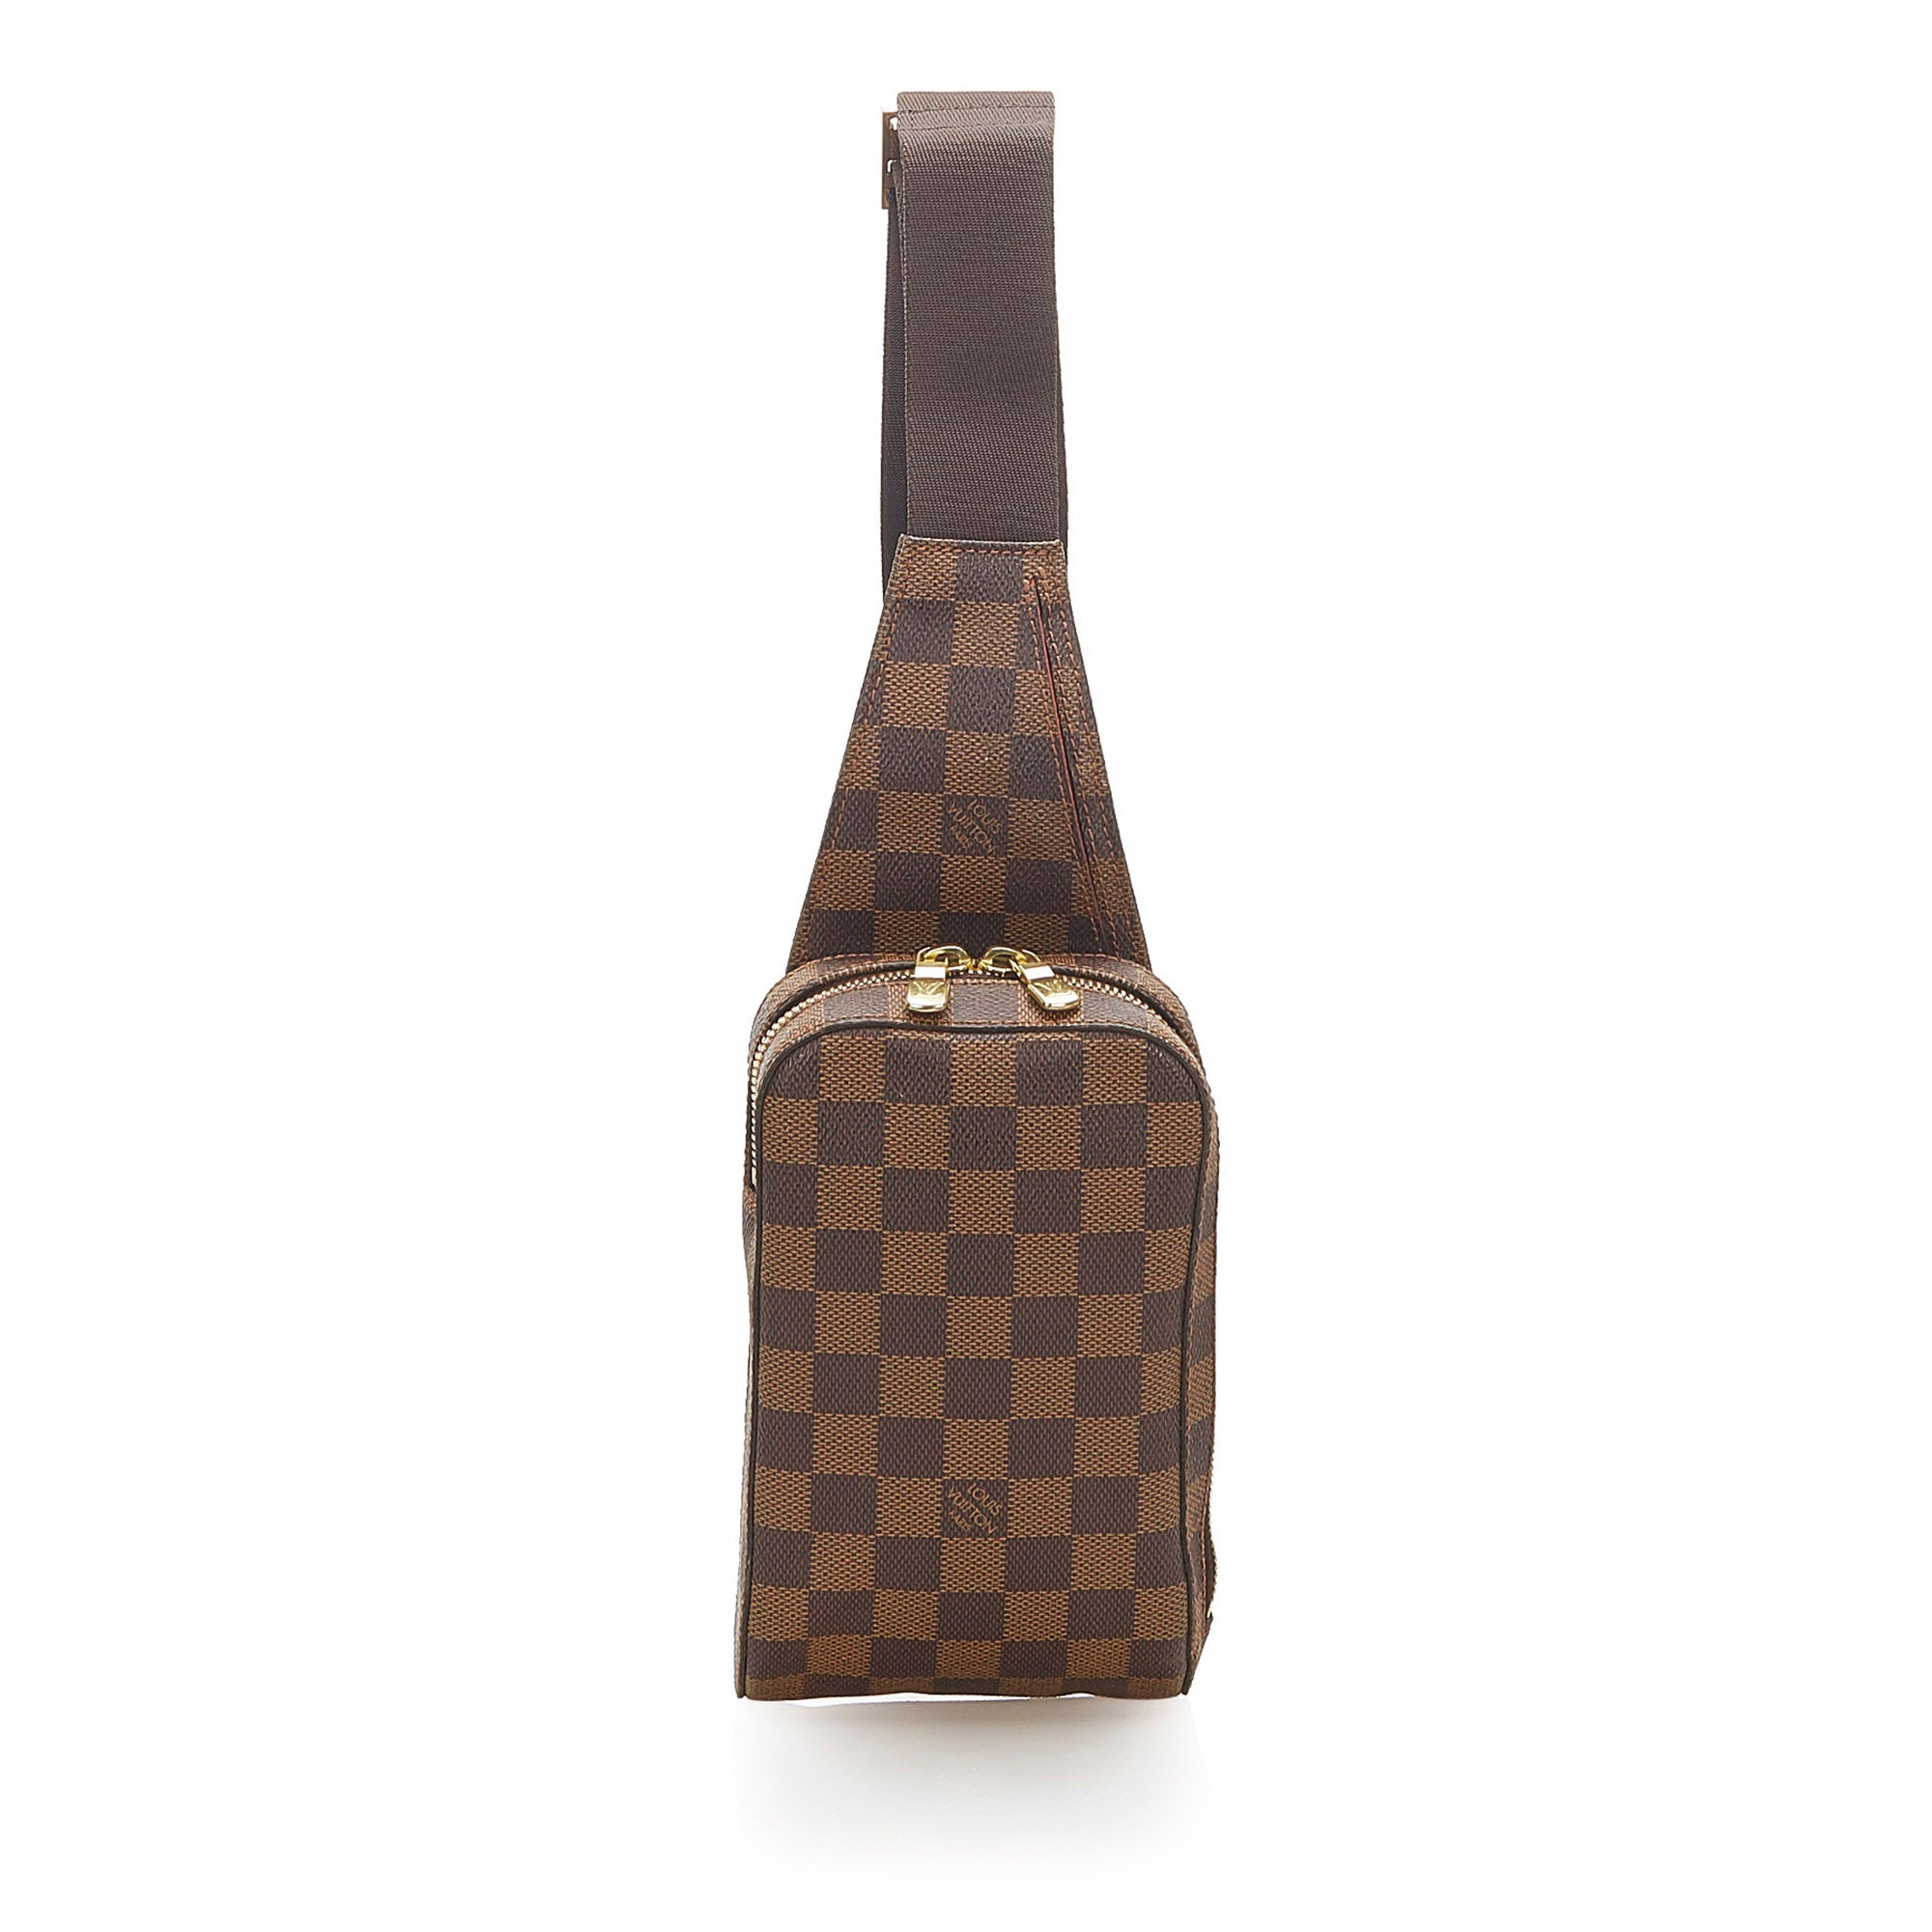 Louis Vuitton Damier Ebene Geronimos